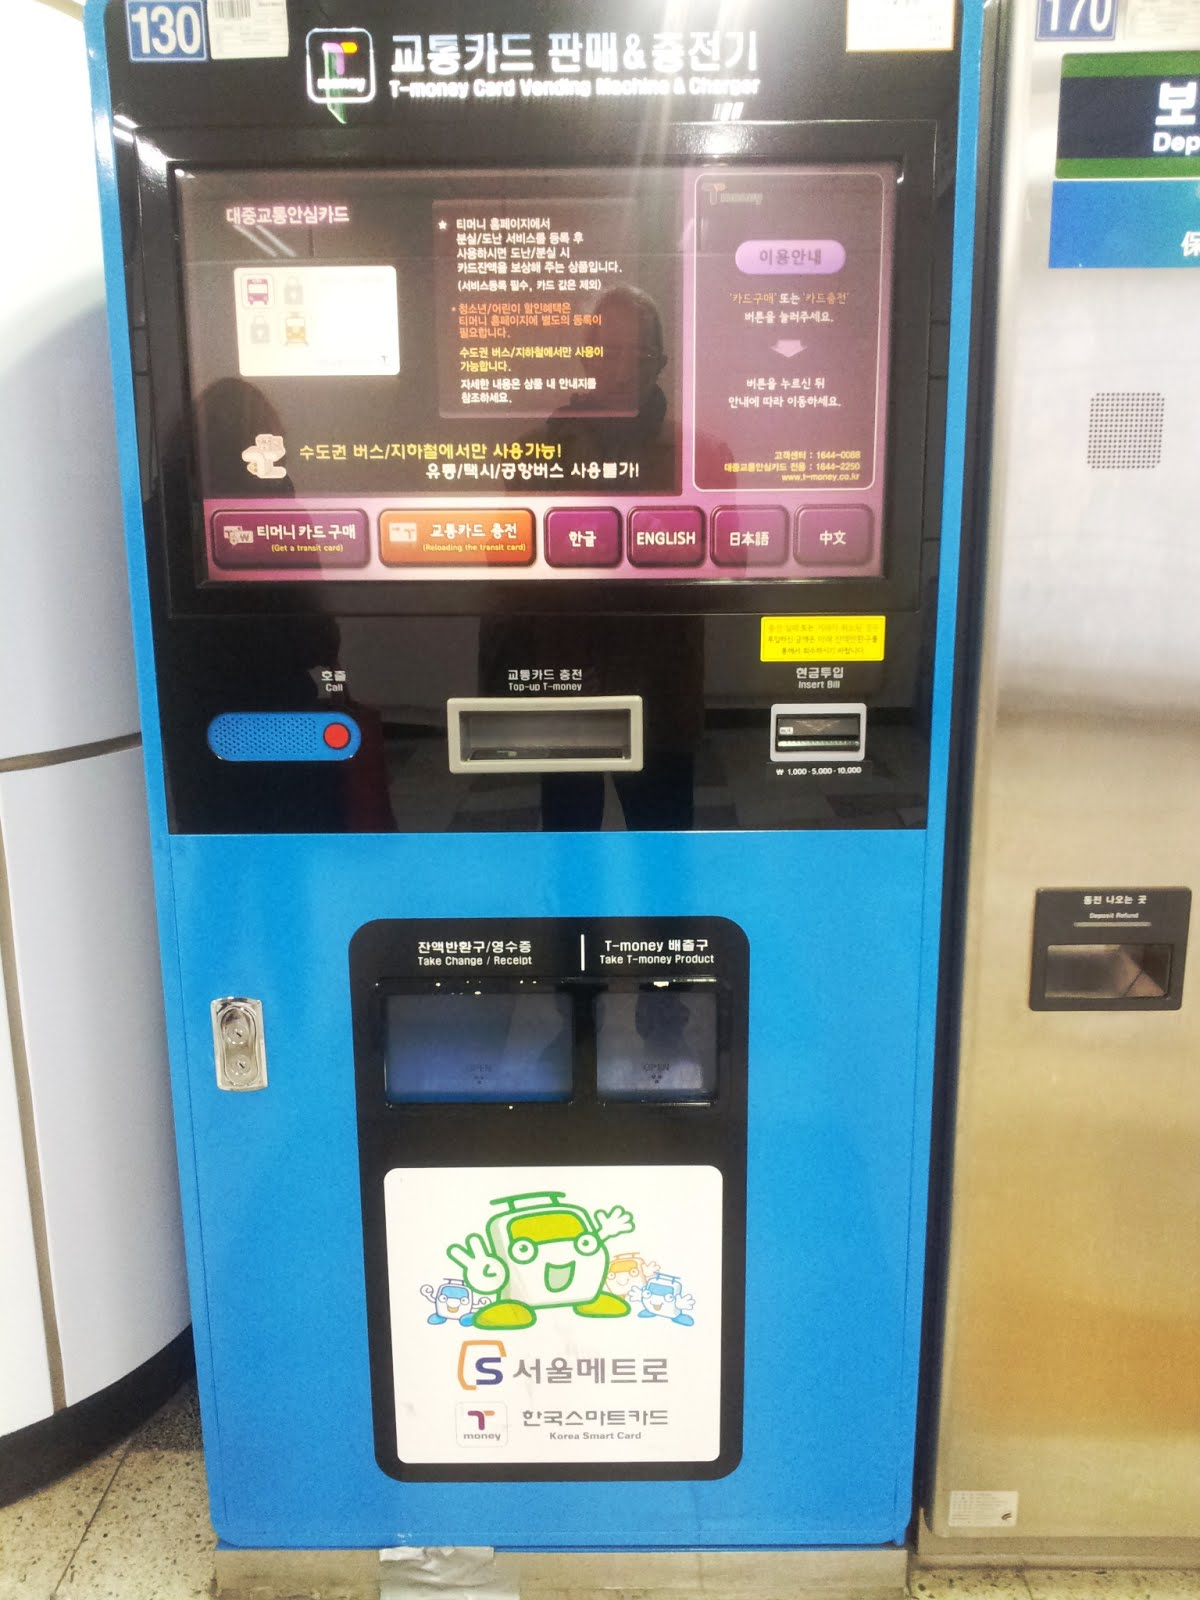 T-Money kart otomatı